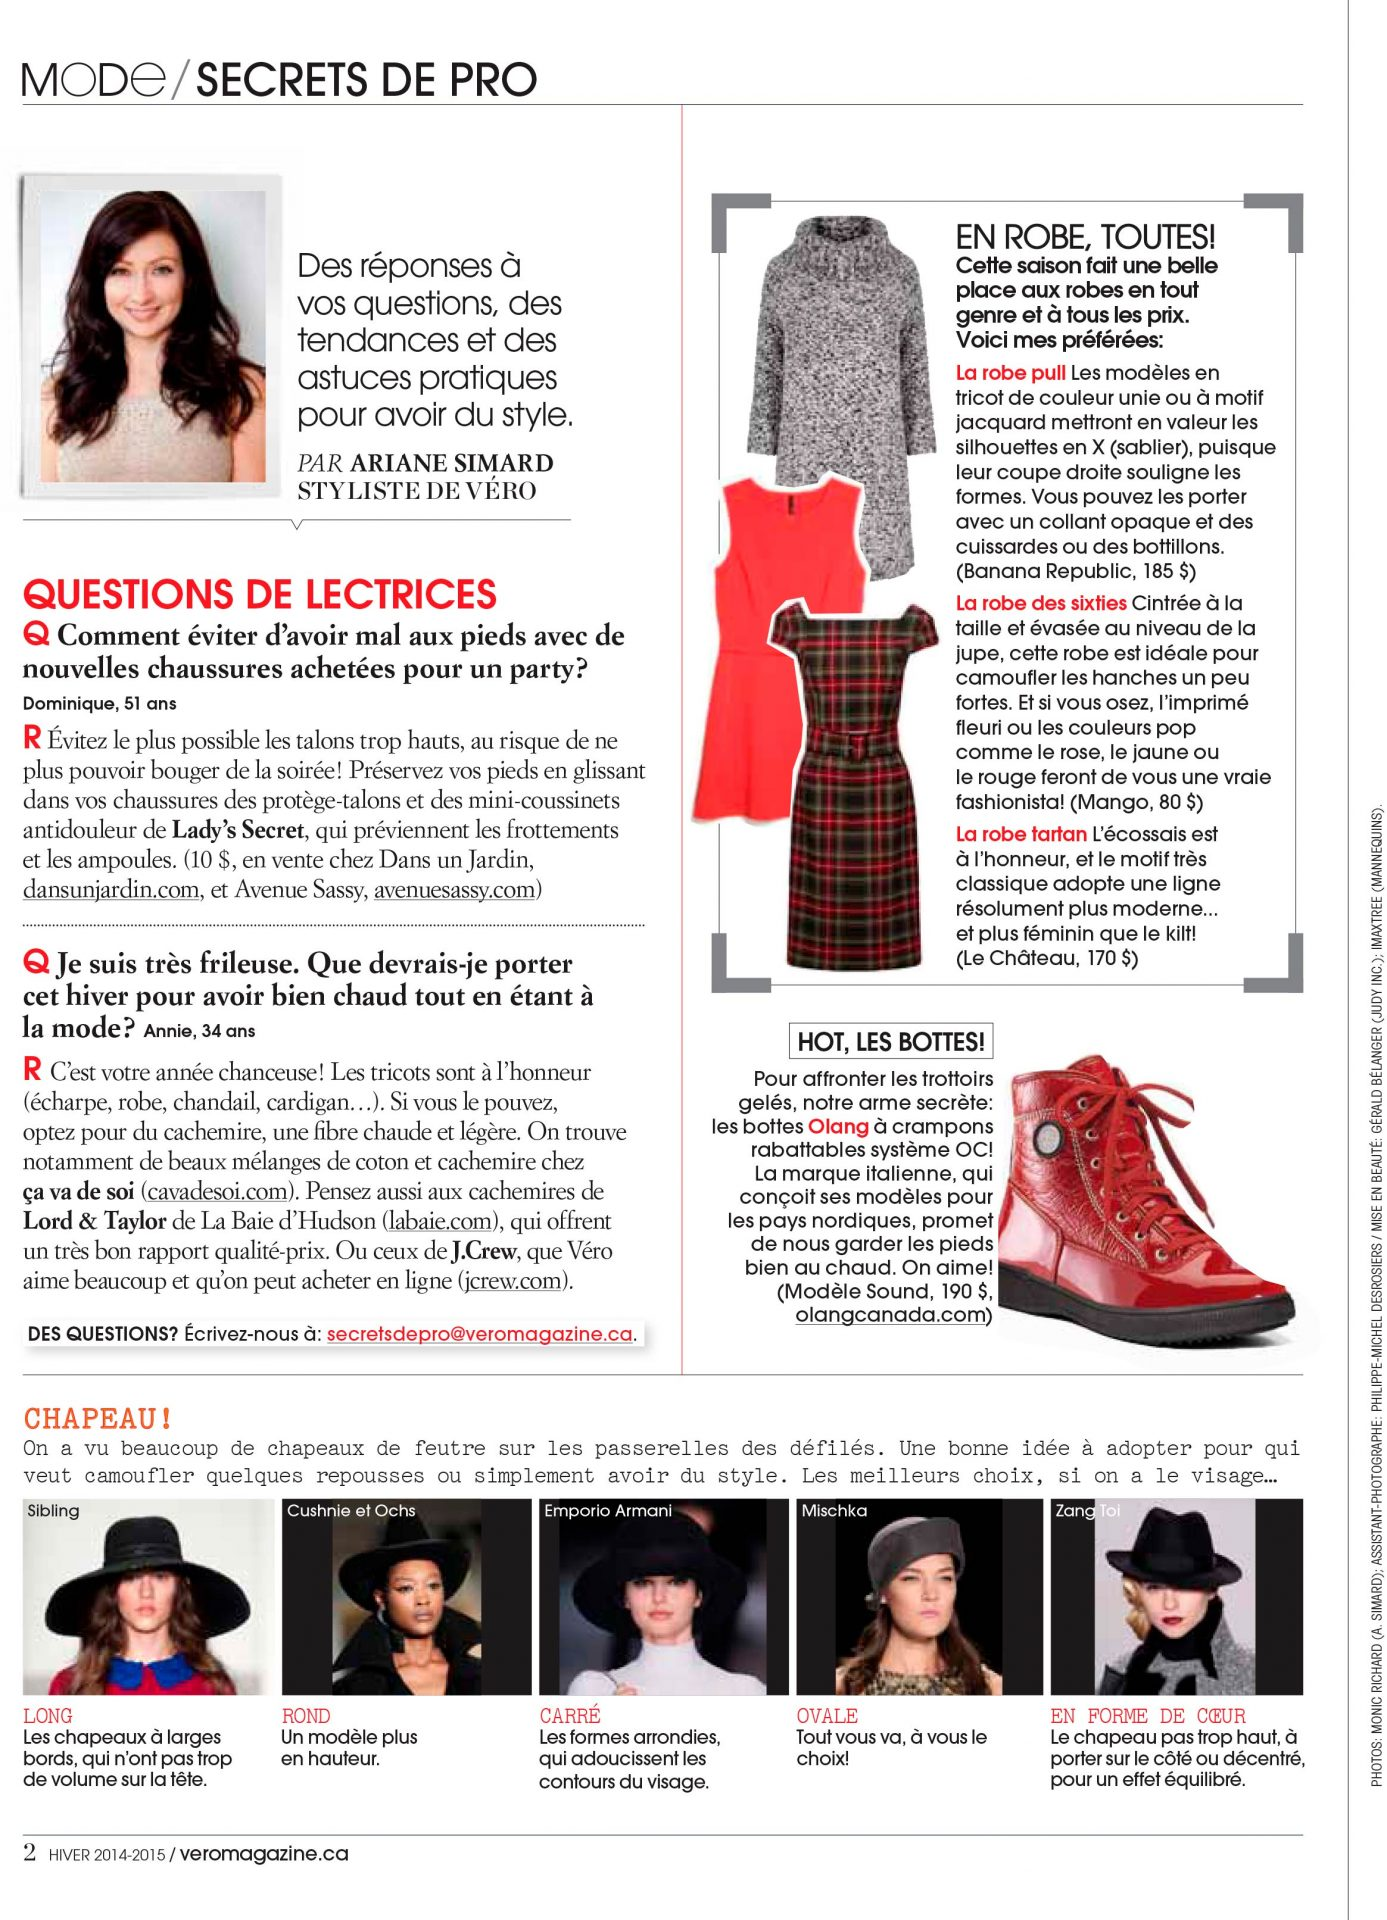 Secrets de pro Magazine Vero Ariane Simard Hiver 2014 2015